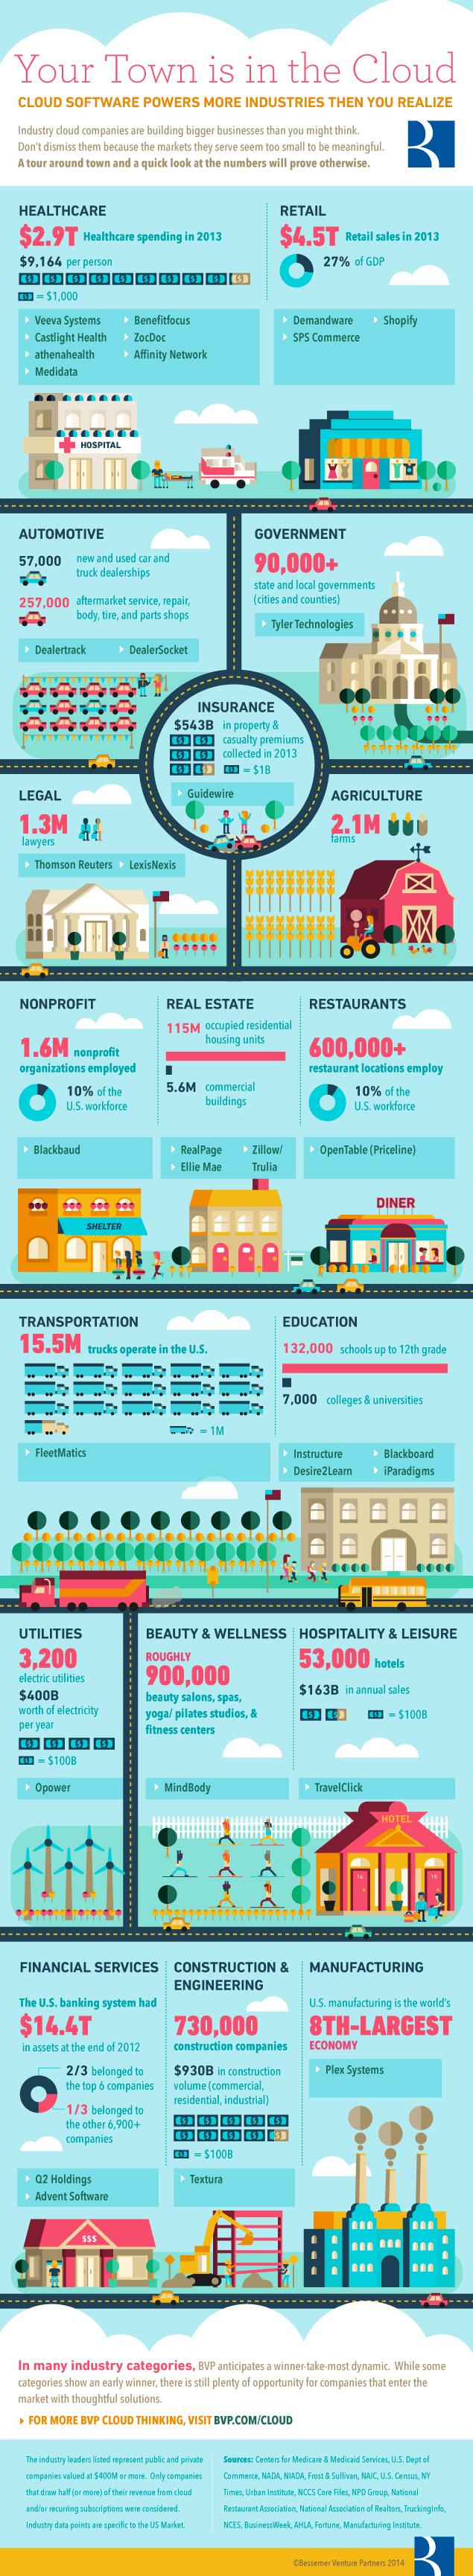 BVP Industry Cloud Infographic[1]